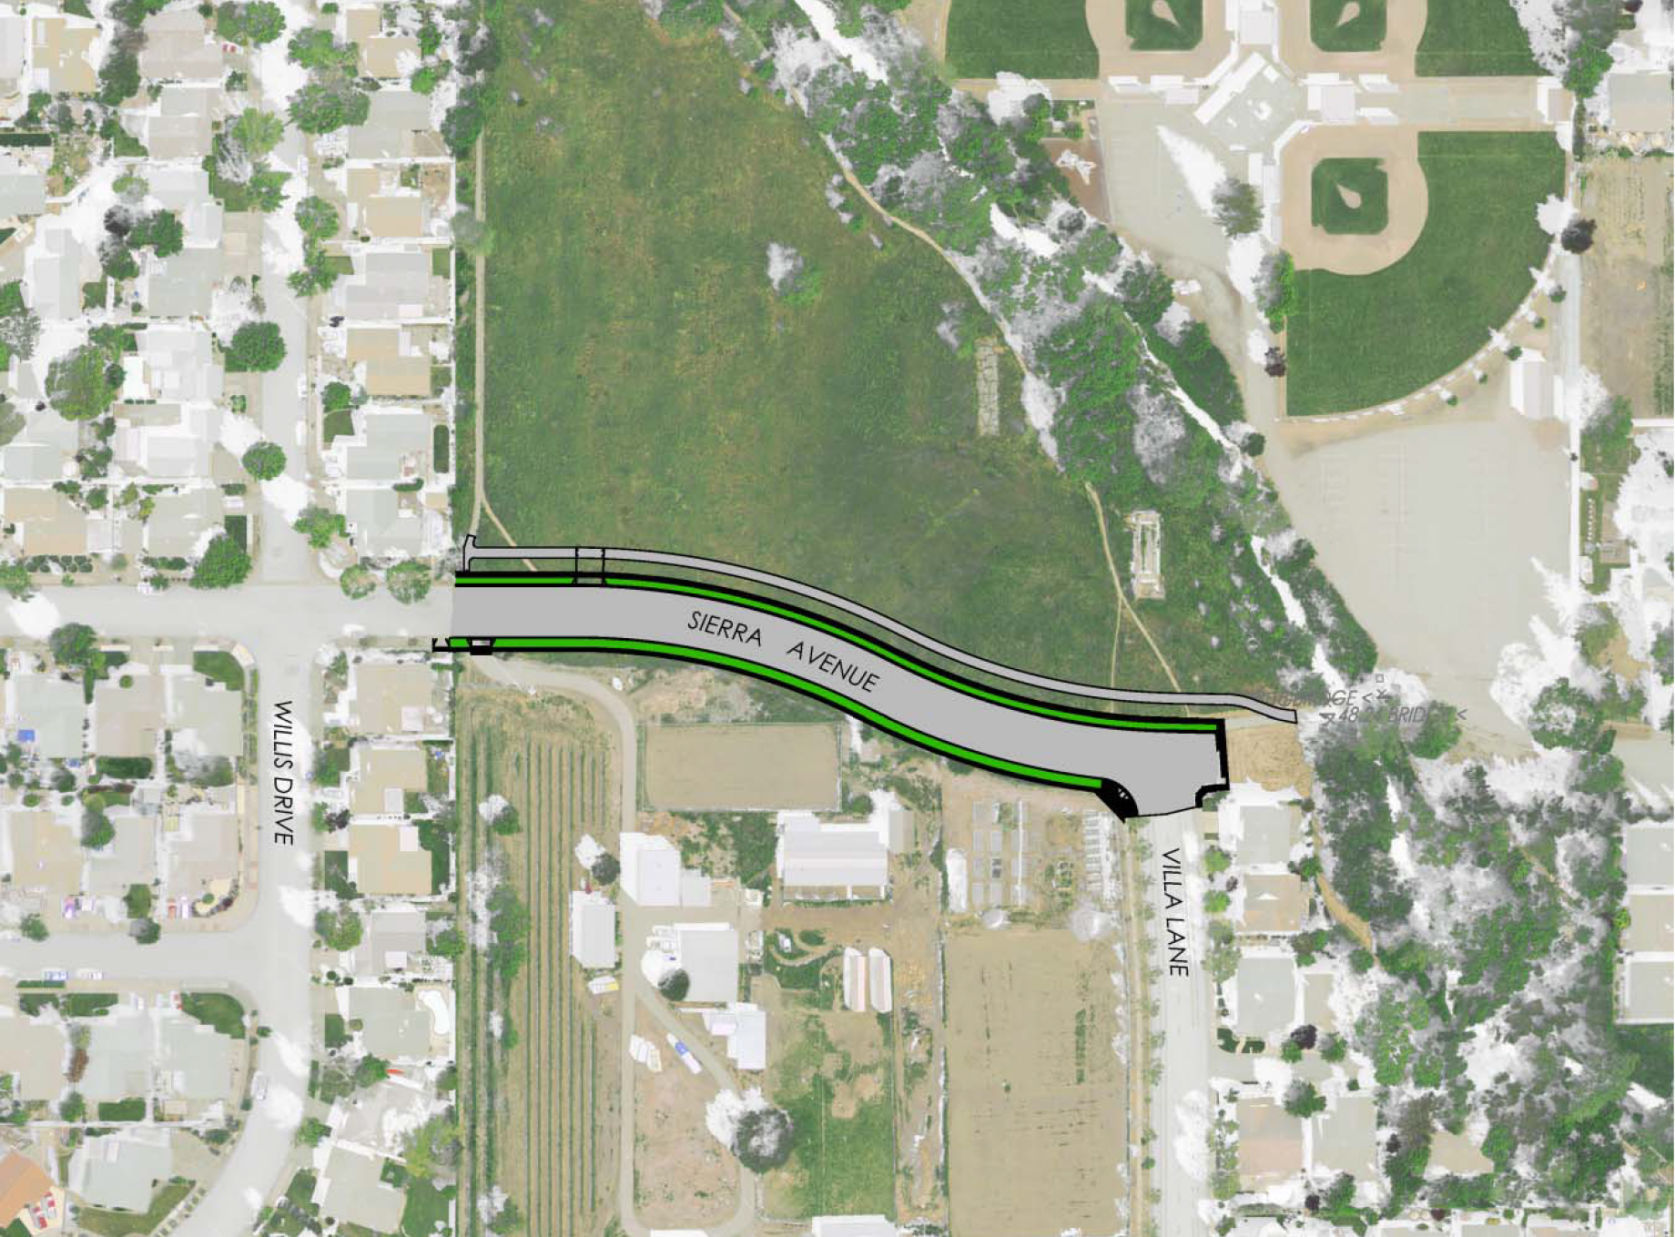 Sierra Avenue extension map Napa council approves